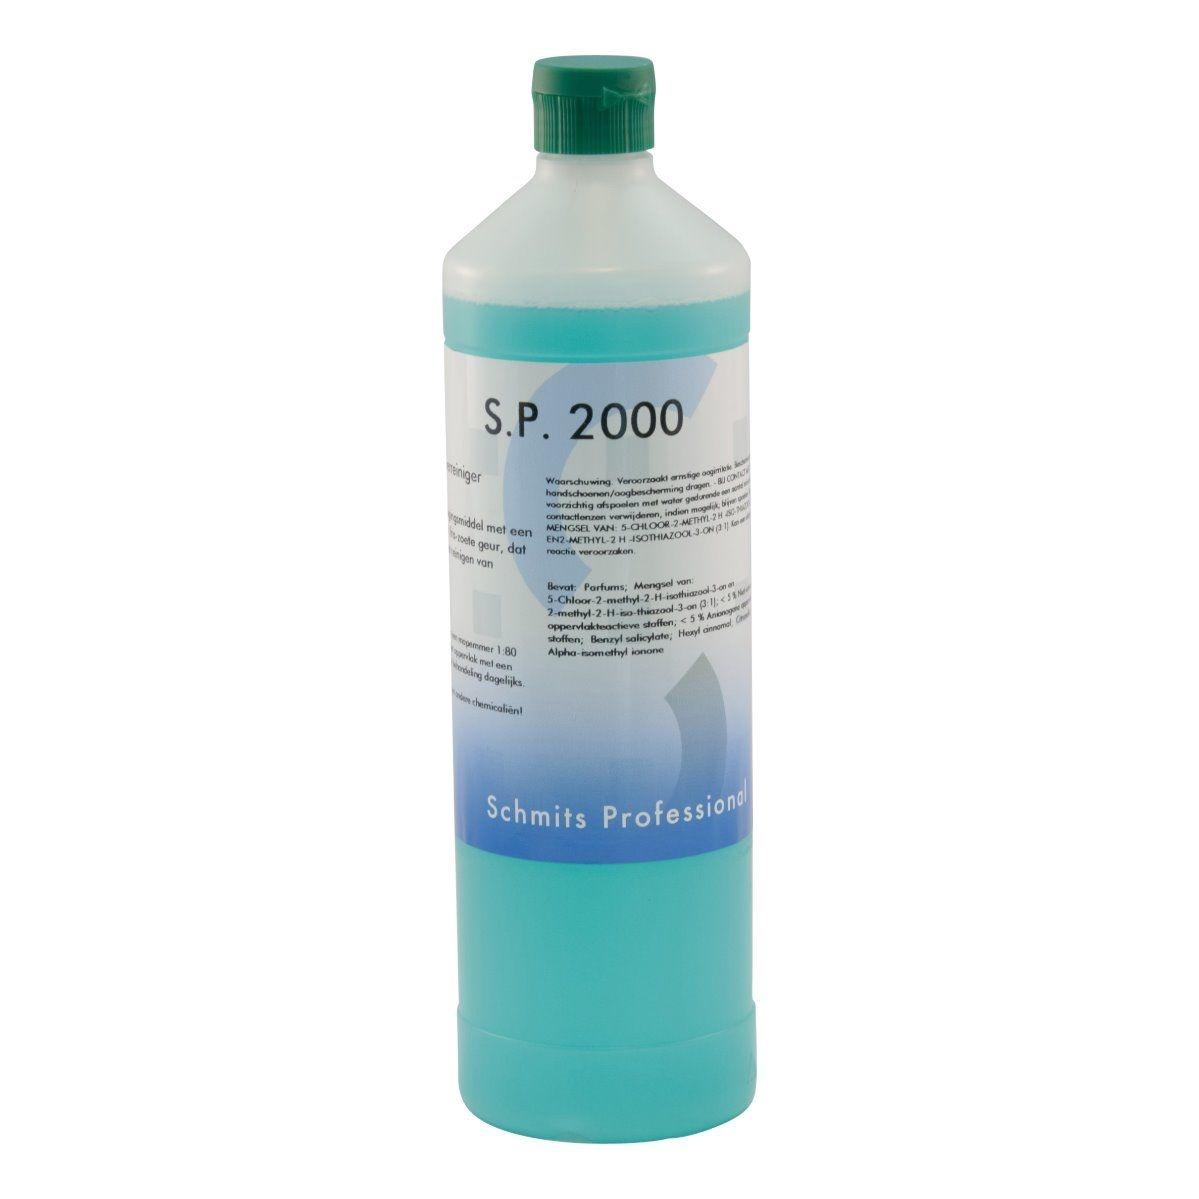 SP 2000 Neutrale vloerreiniger extra parfum 1 ltr - 12 fles per doos